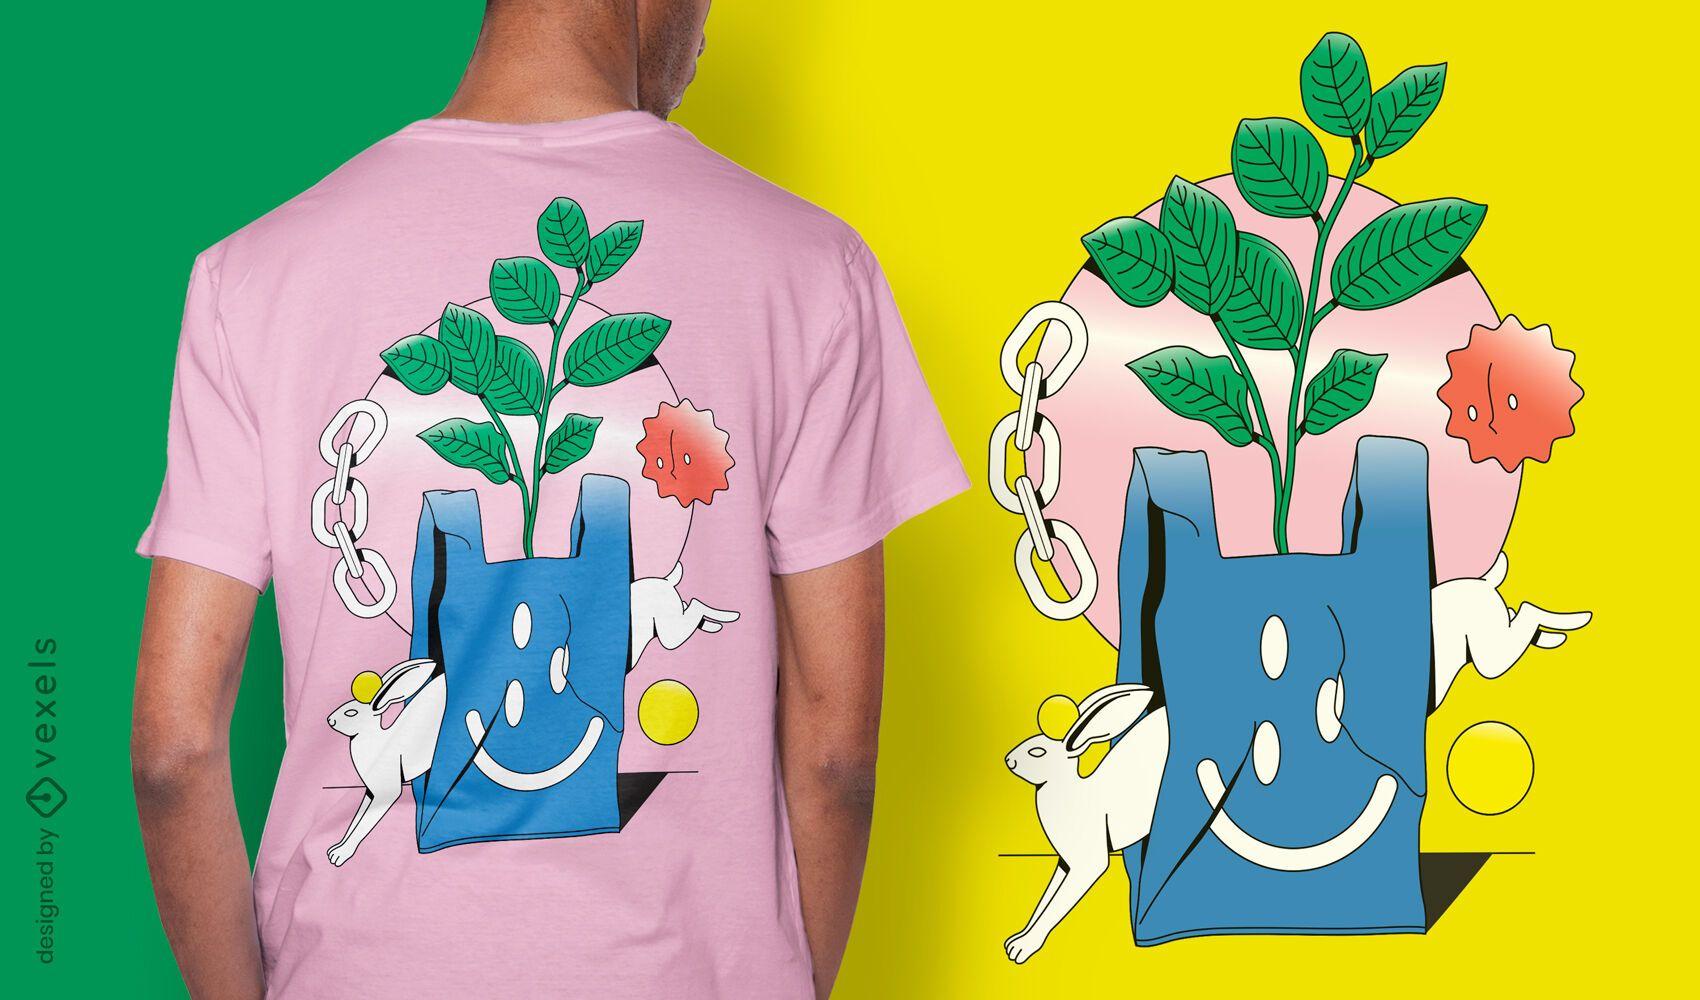 Abstract bag t-shirt design